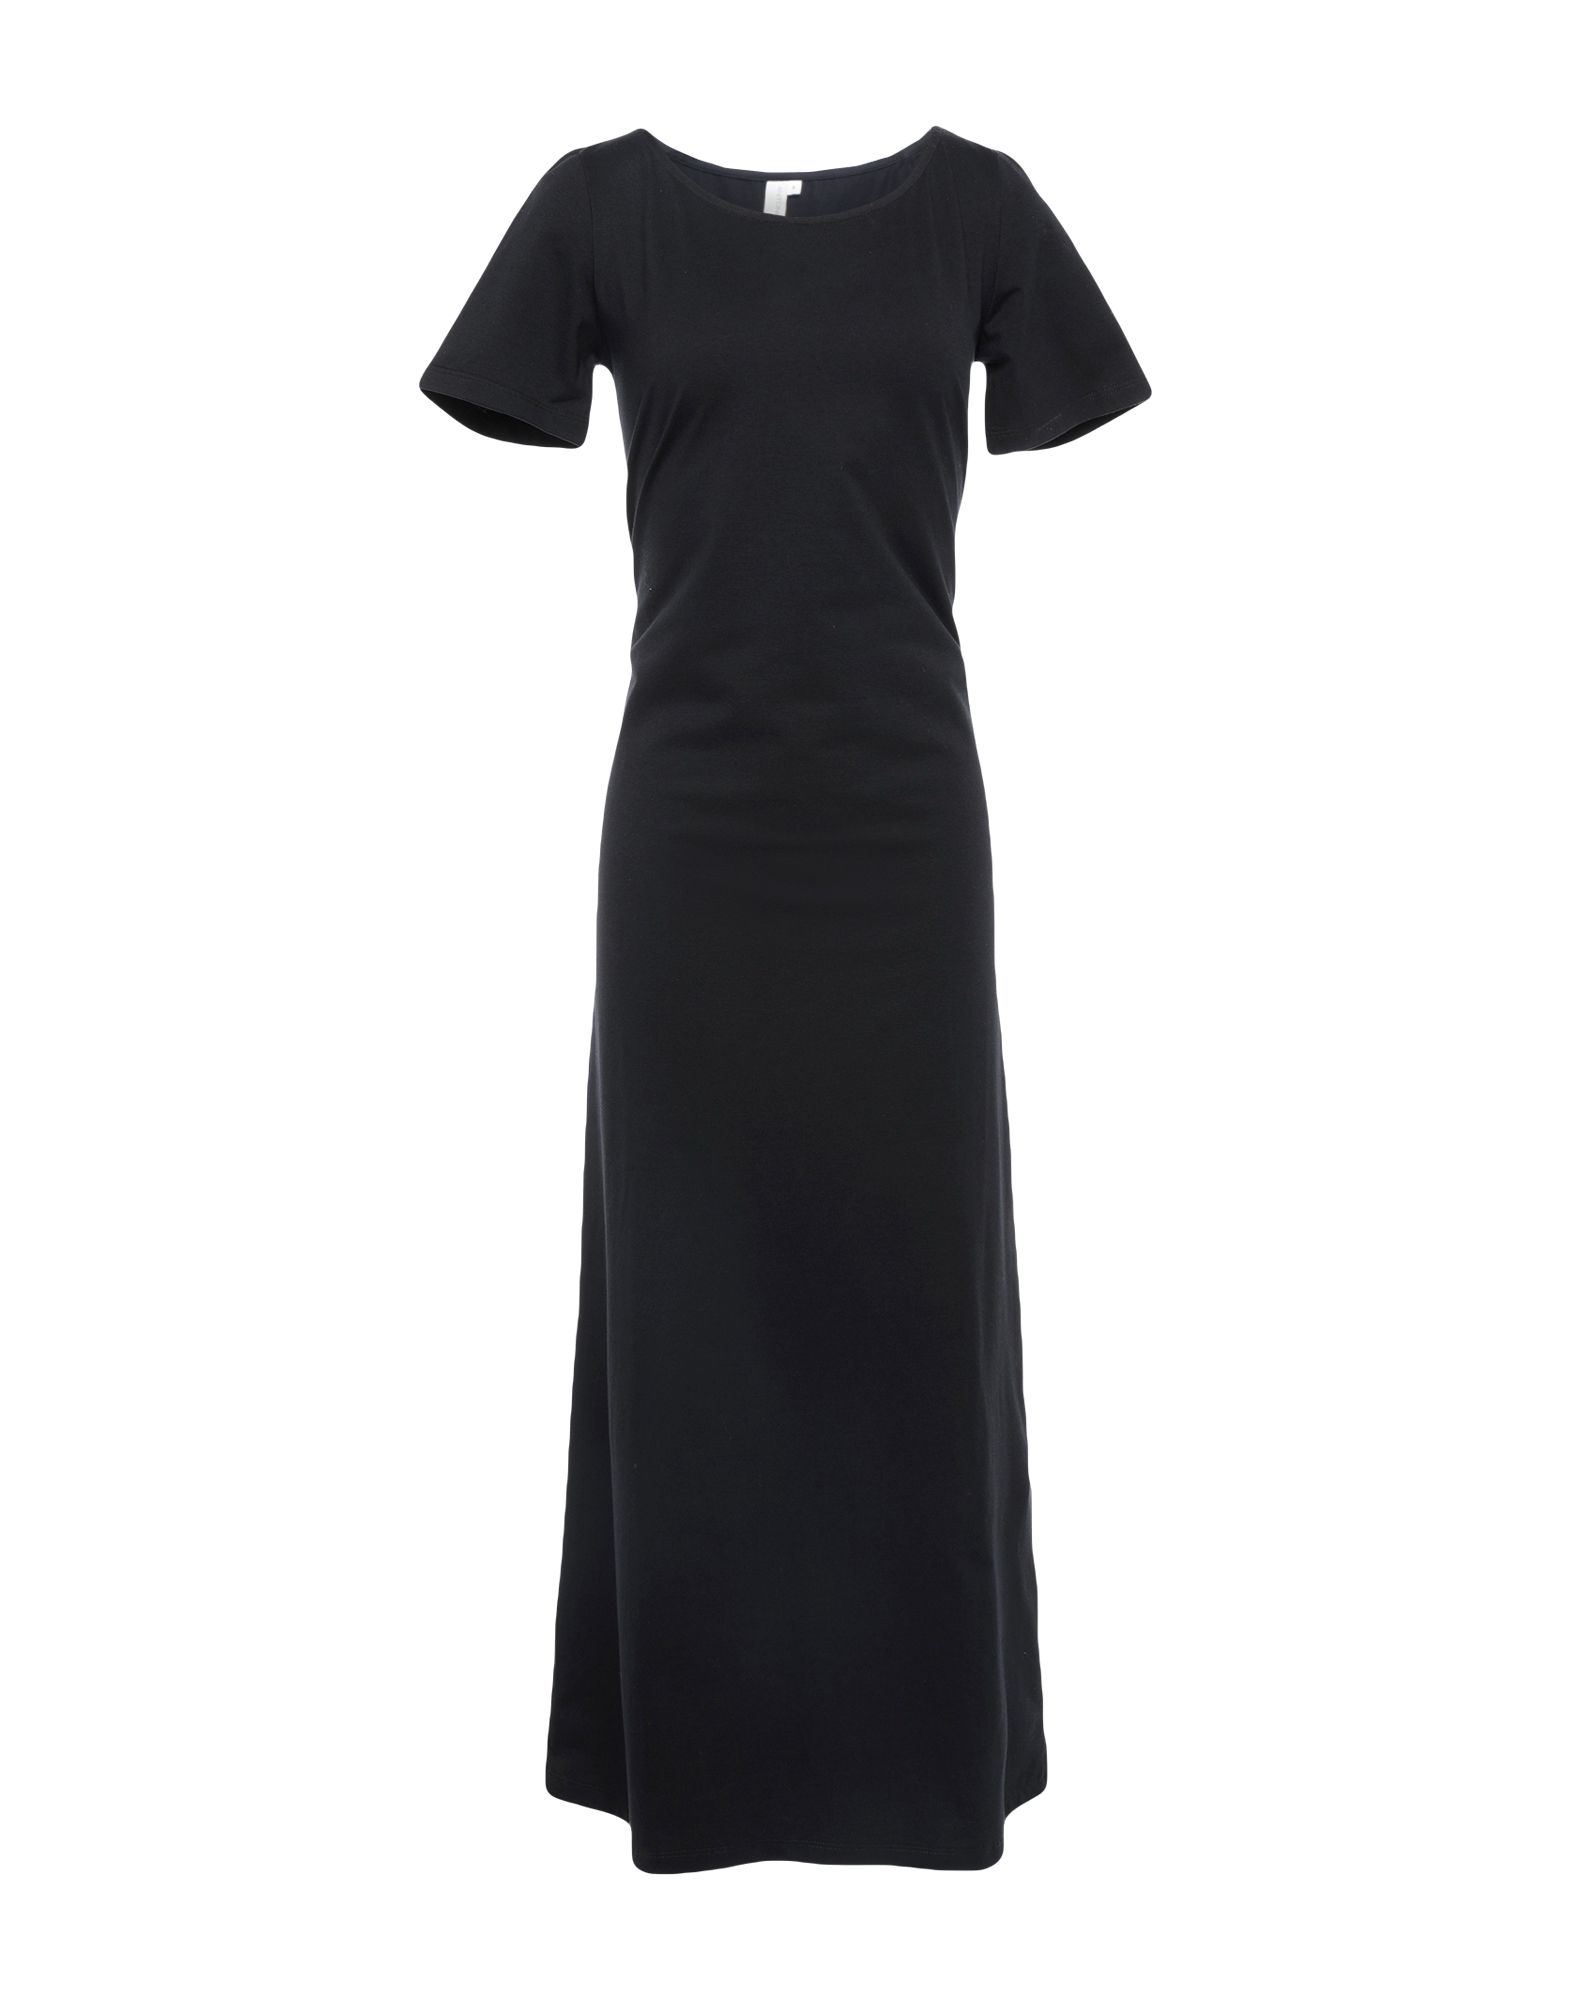 ANTONELLA VALSECCHI Длинное платье